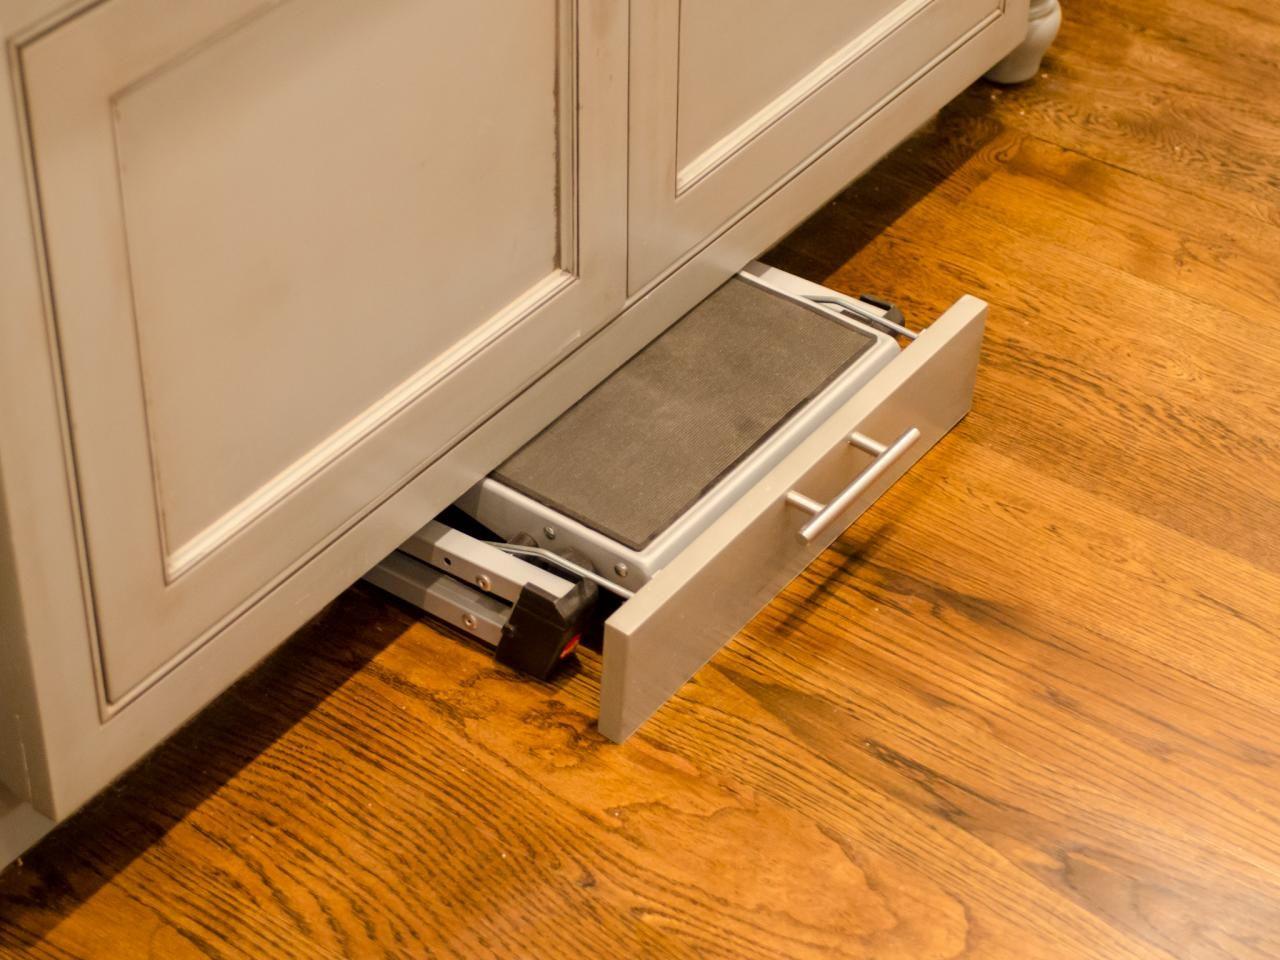 hidden step stool to access higher cabinets kitchen layout design ideas diy kitchen design id on kitchen cabinets organization layout id=53836